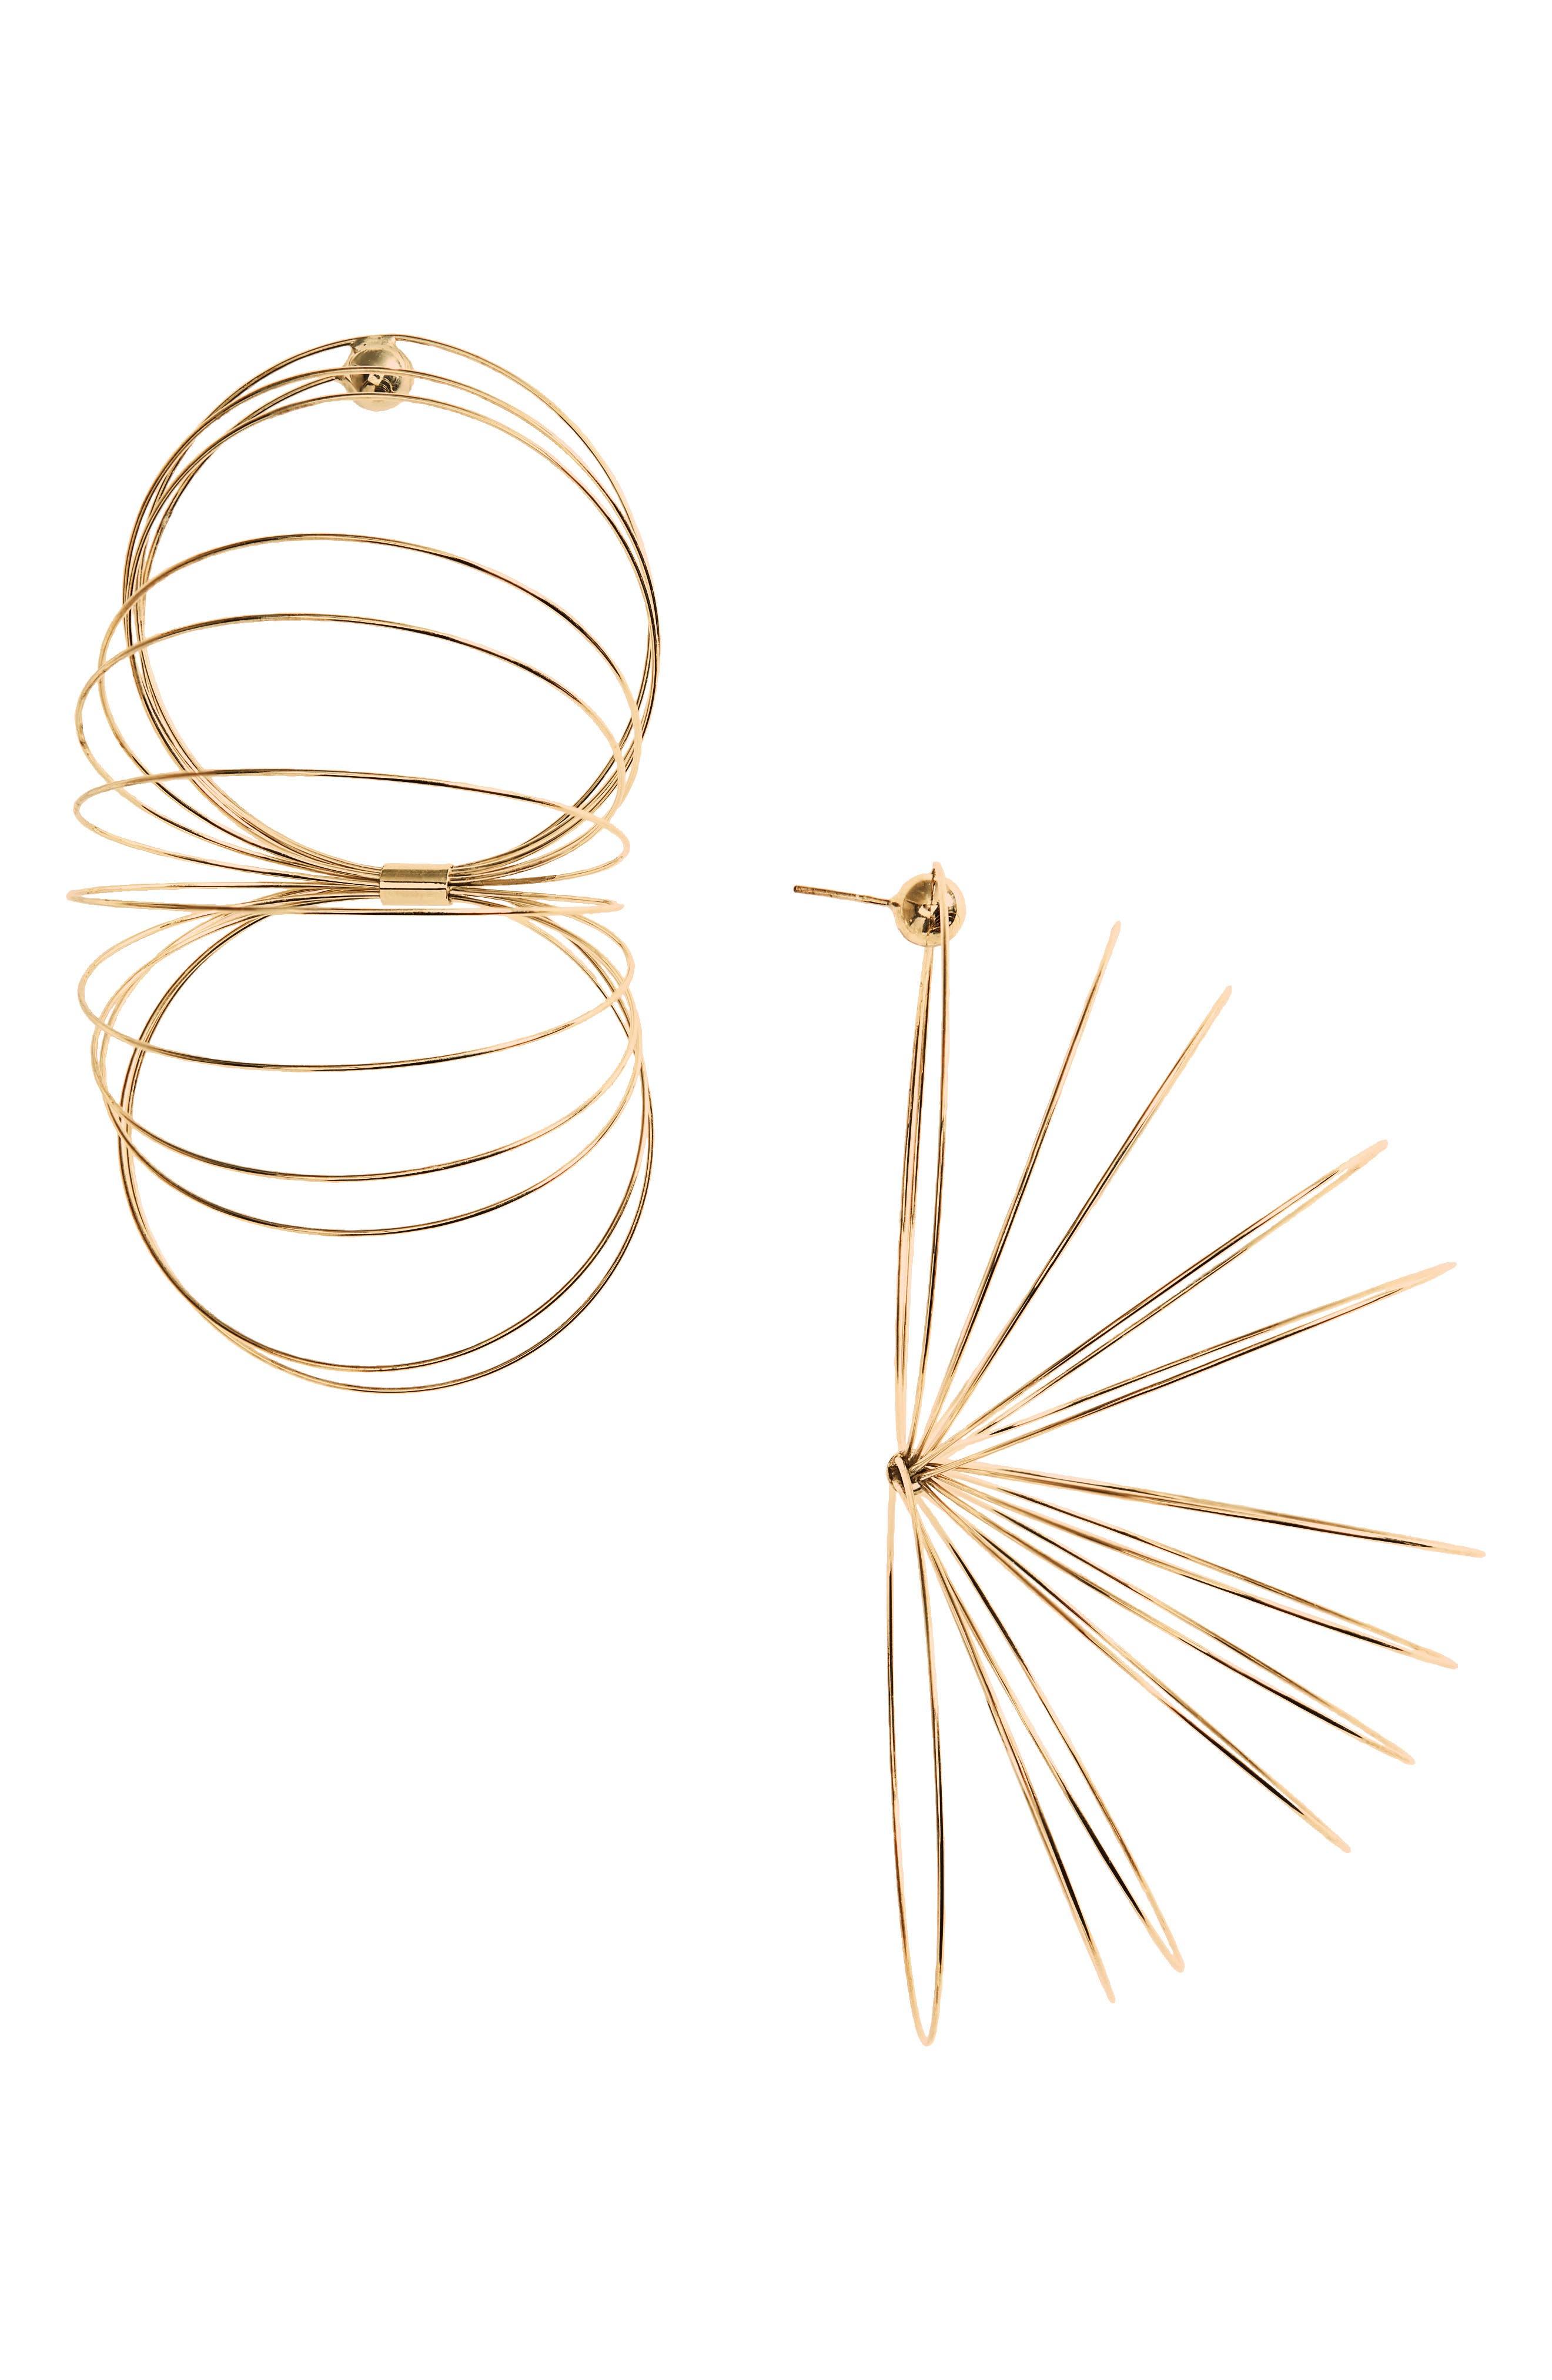 Slinky Earrings,                         Main,                         color, GOLD